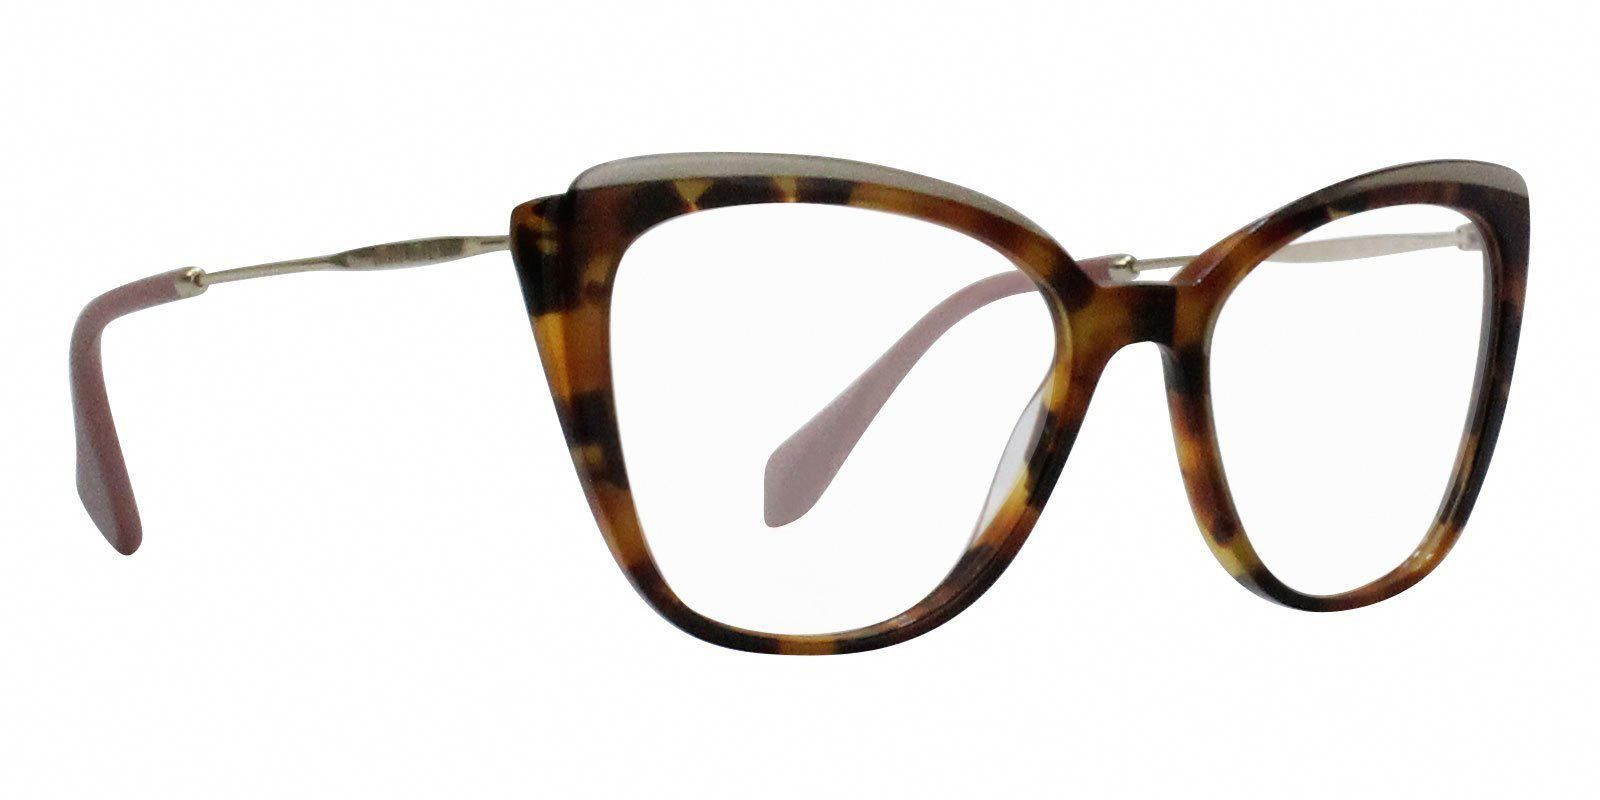 5c36d995042 Miu Miu - MU02QV Tortoise eyeglasses